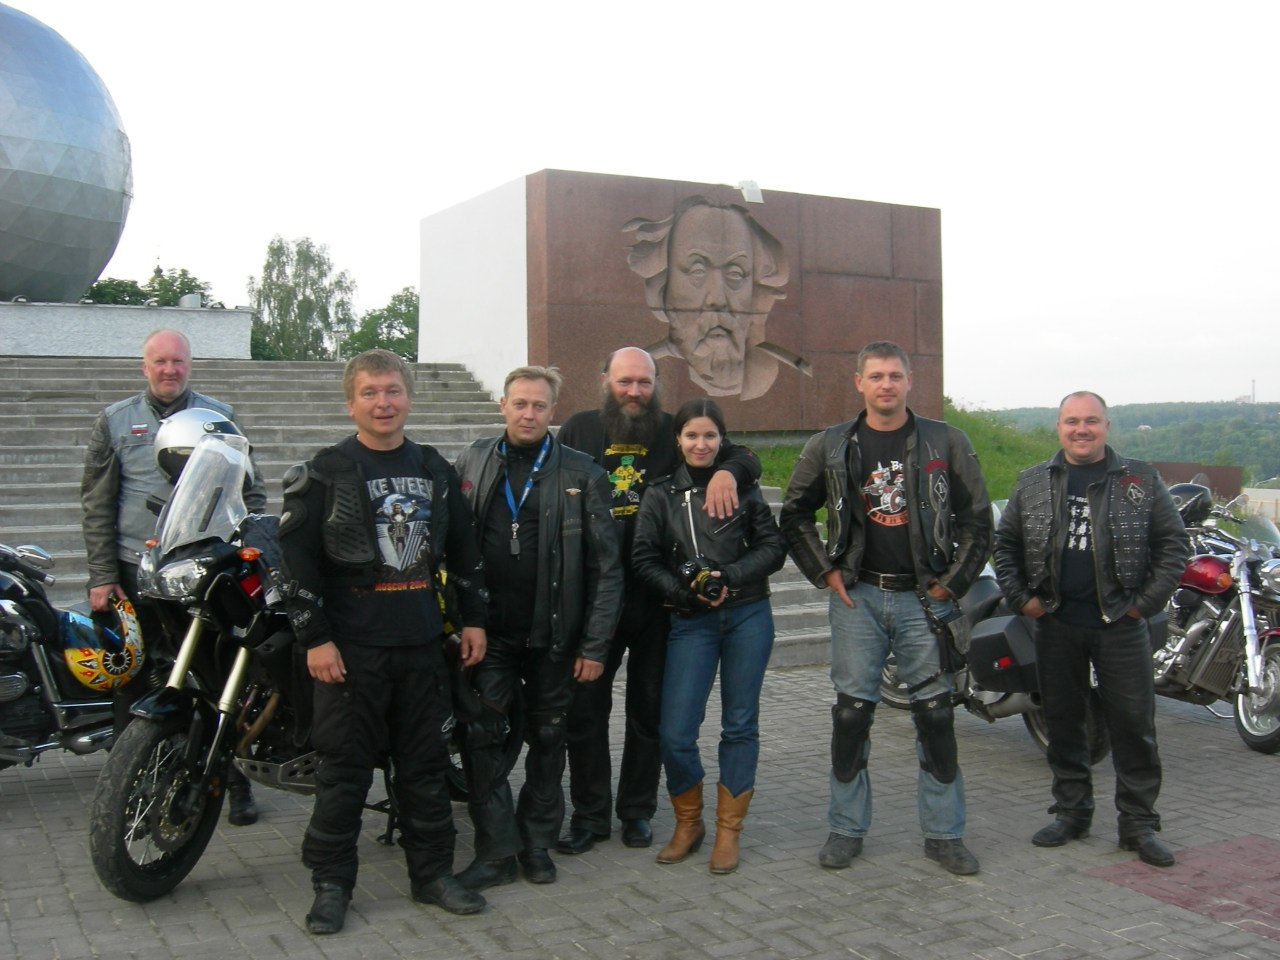 ЕВРОПА-2012. XdR9bEuiN1o